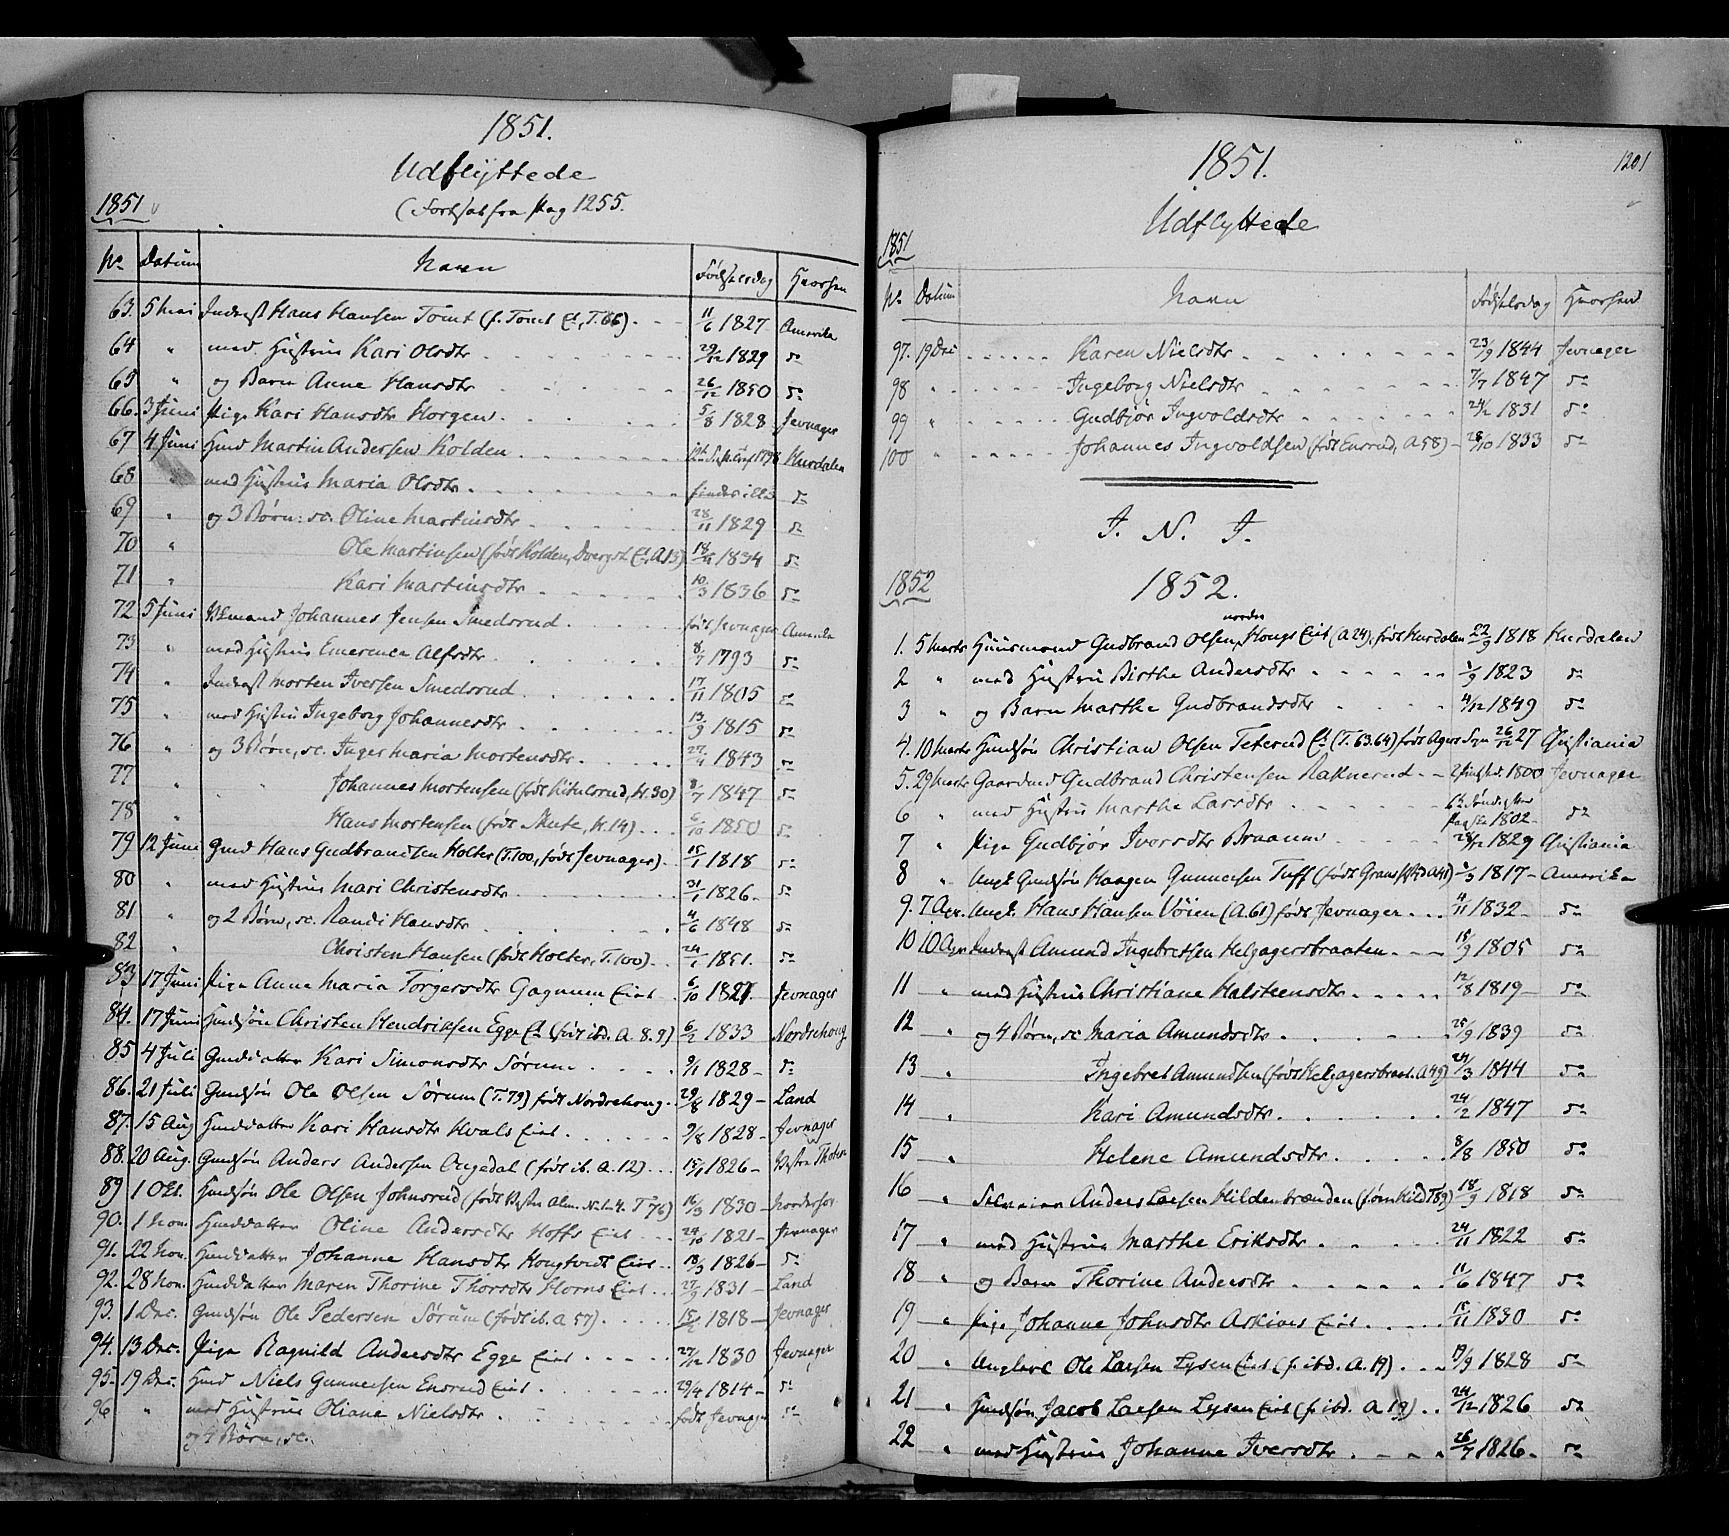 SAH, Gran prestekontor, Ministerialbok nr. 11, 1842-1856, s. 1200-1201